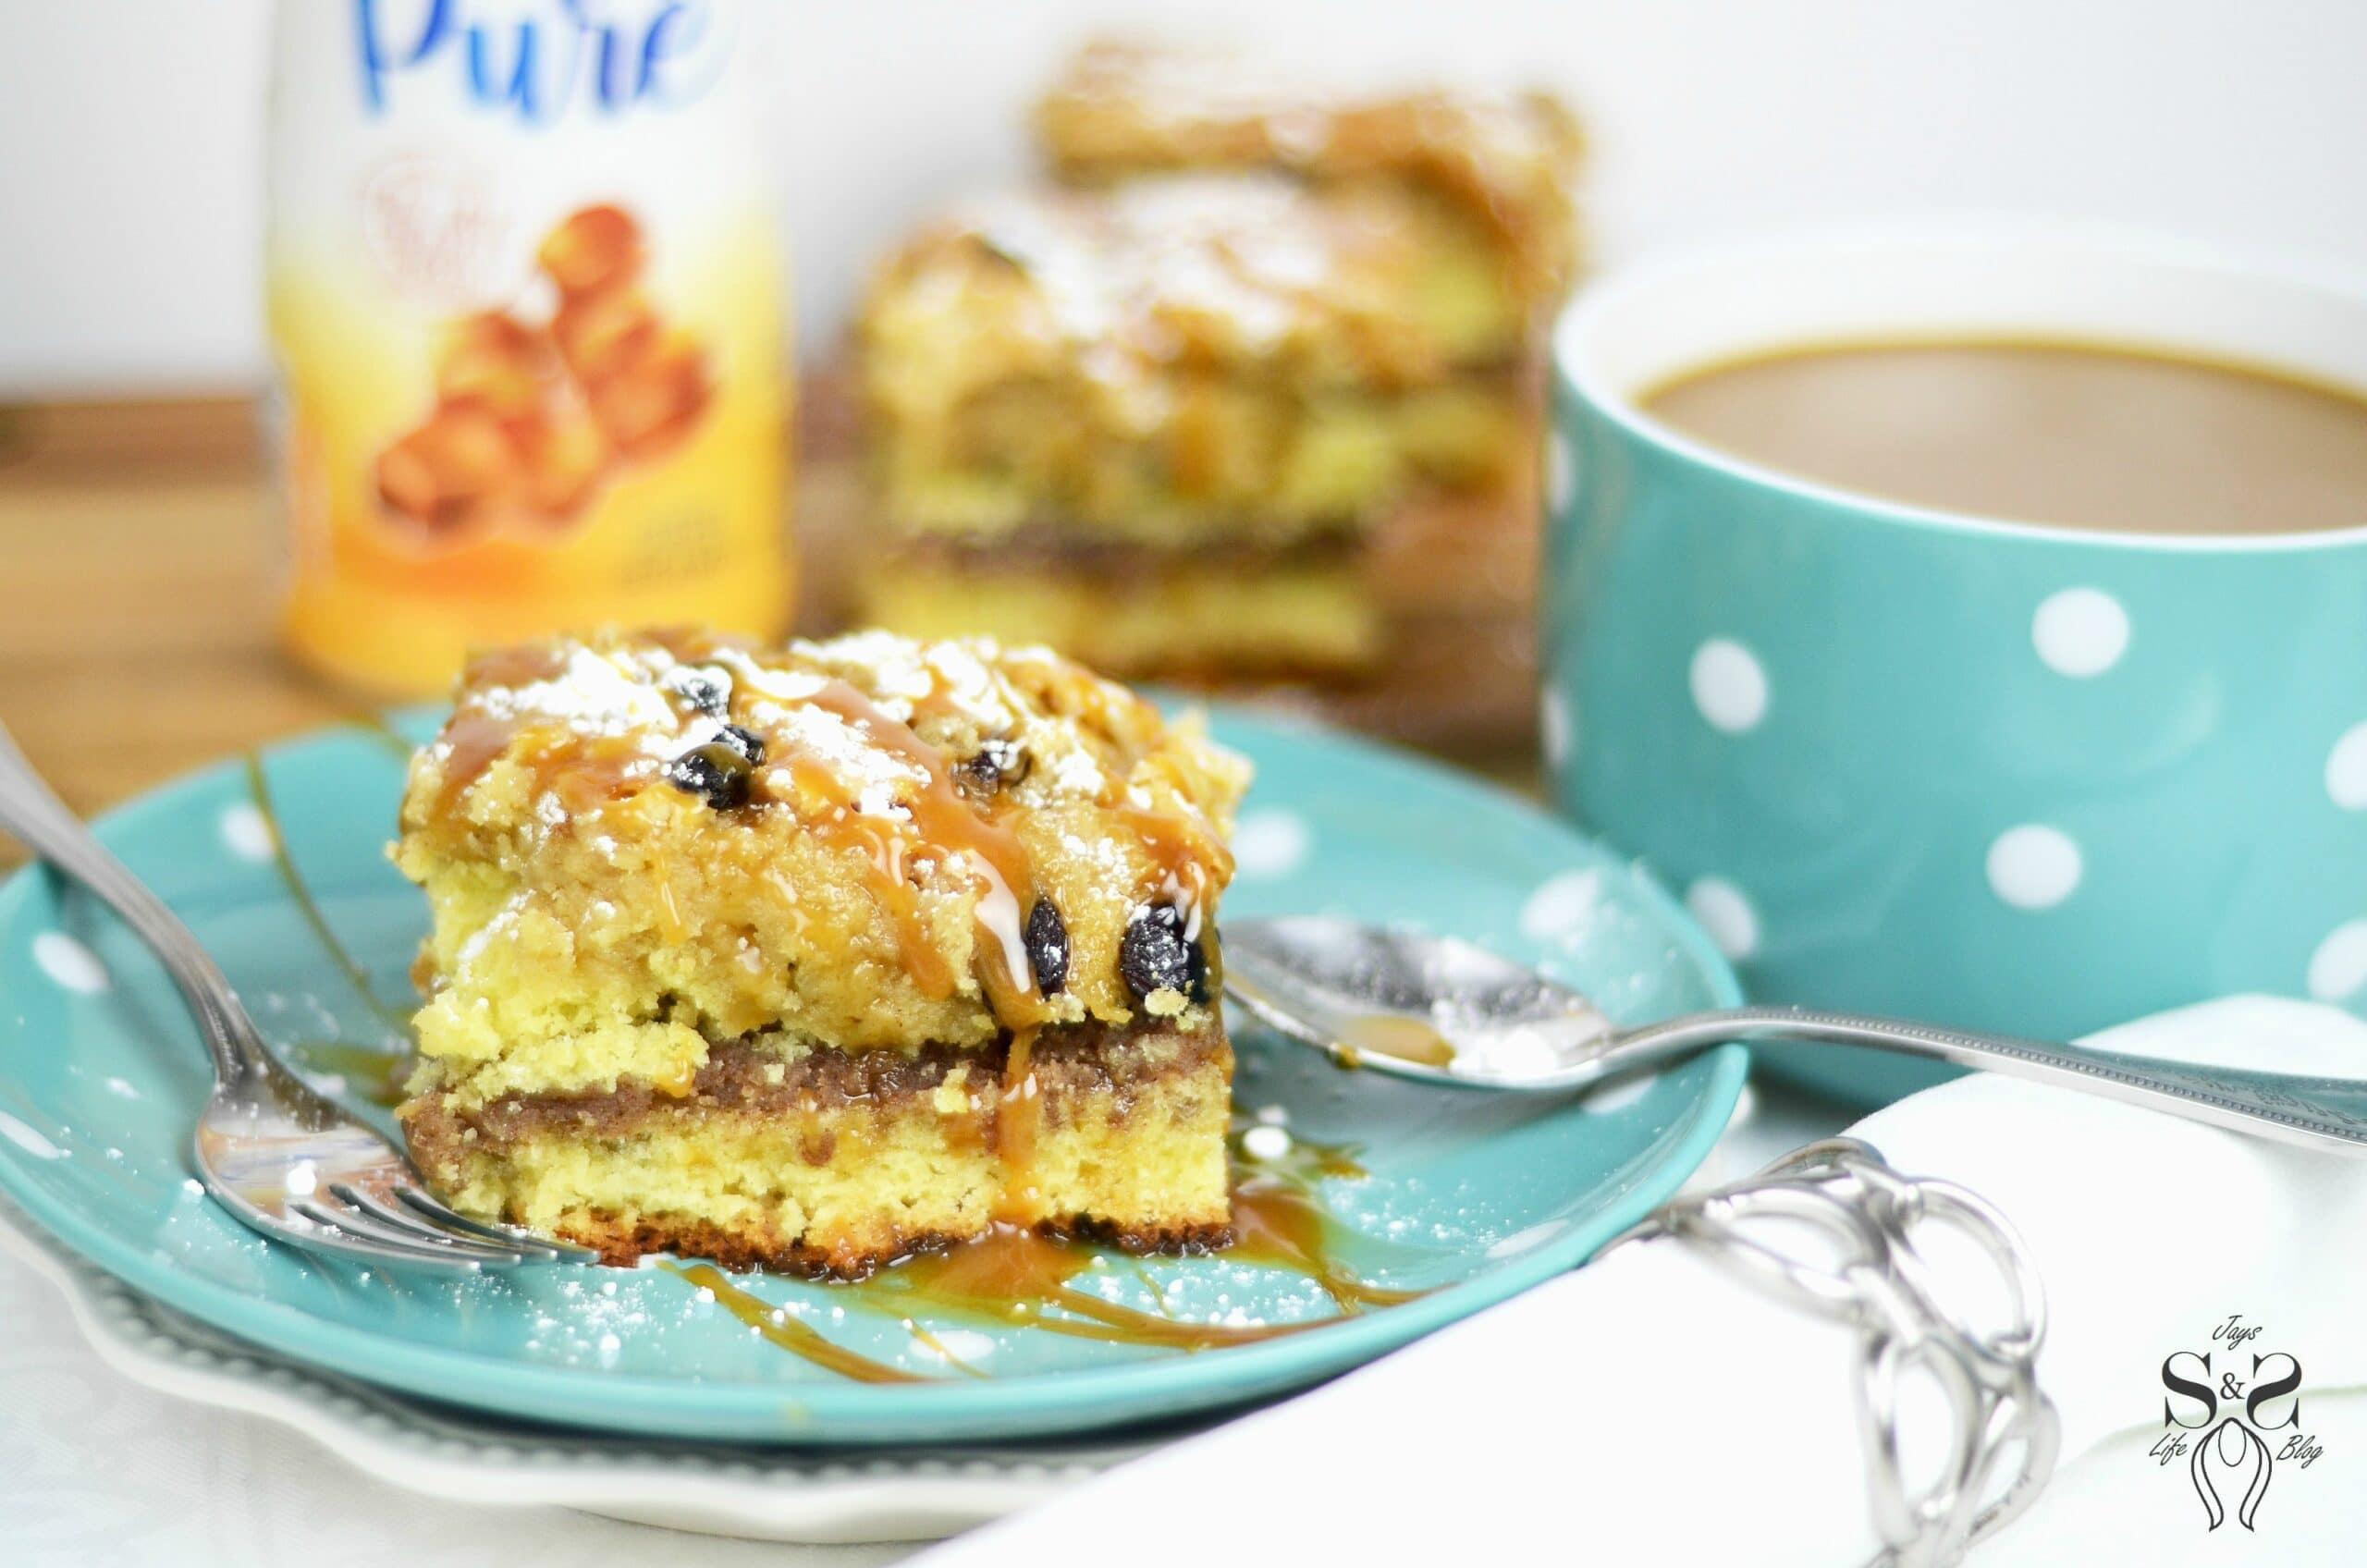 Cinnamon Coffee Cake with Salted Caramel